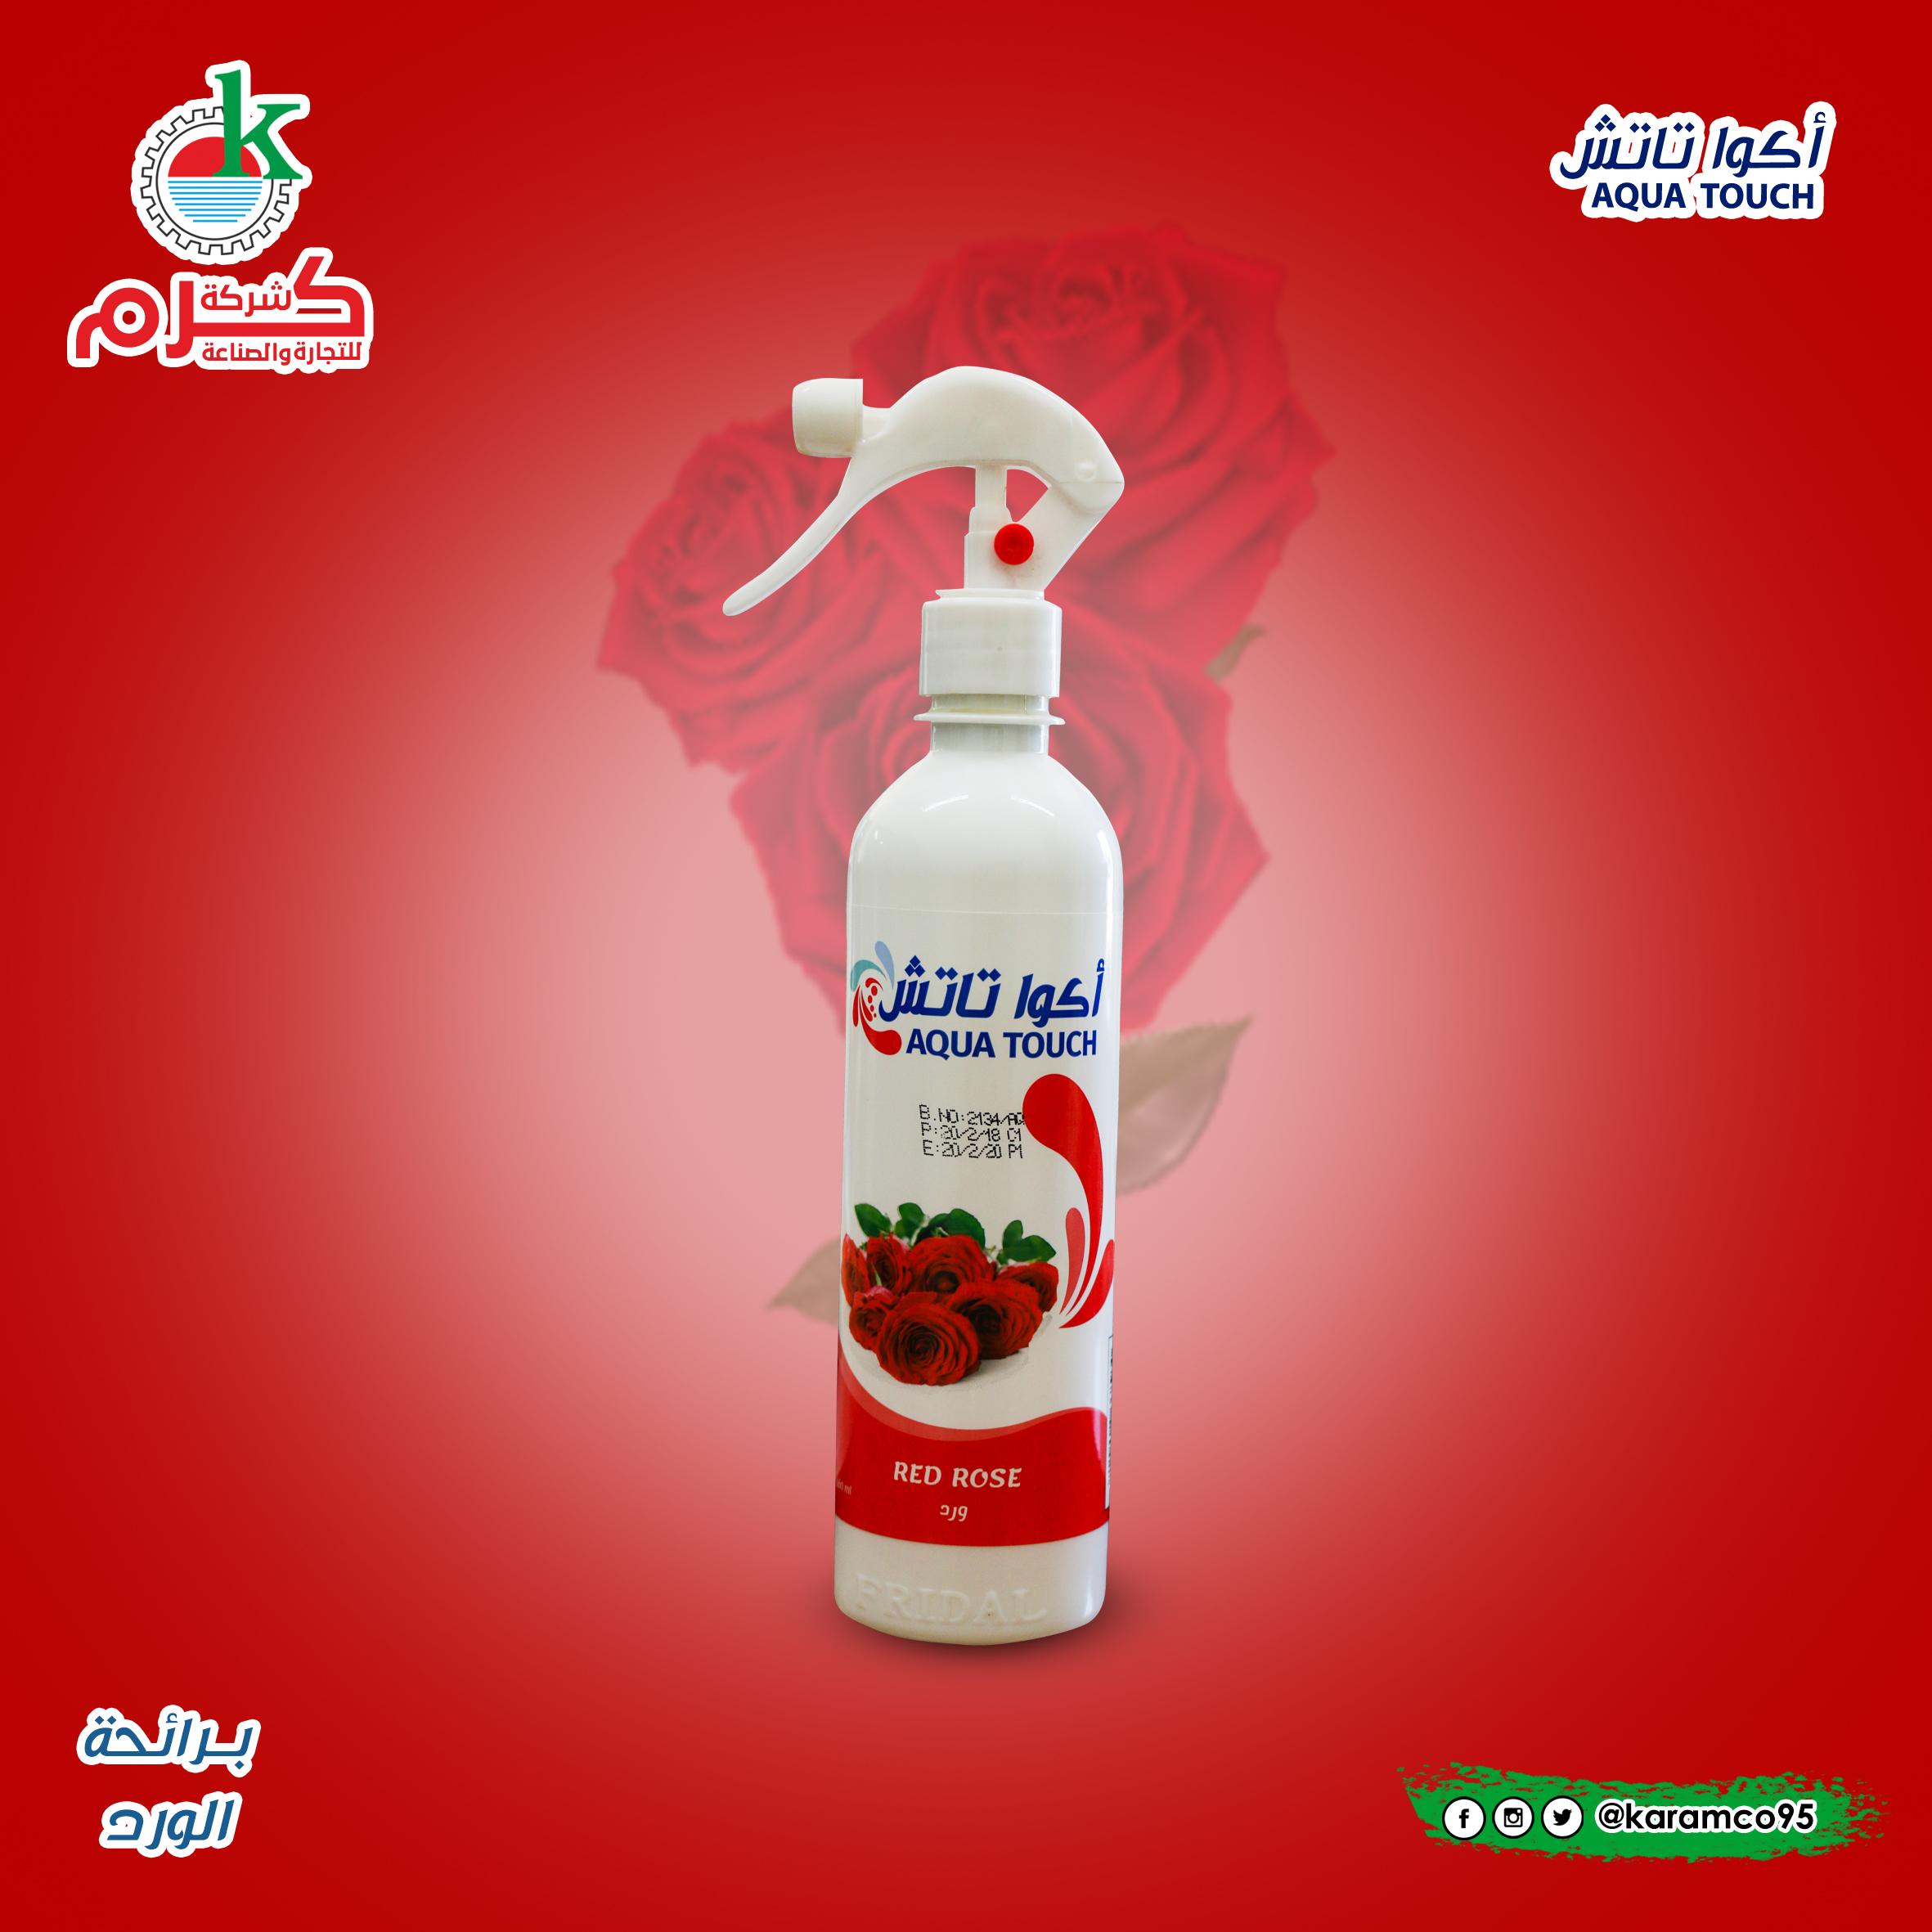 Aqua Touch Air Freshener Roses